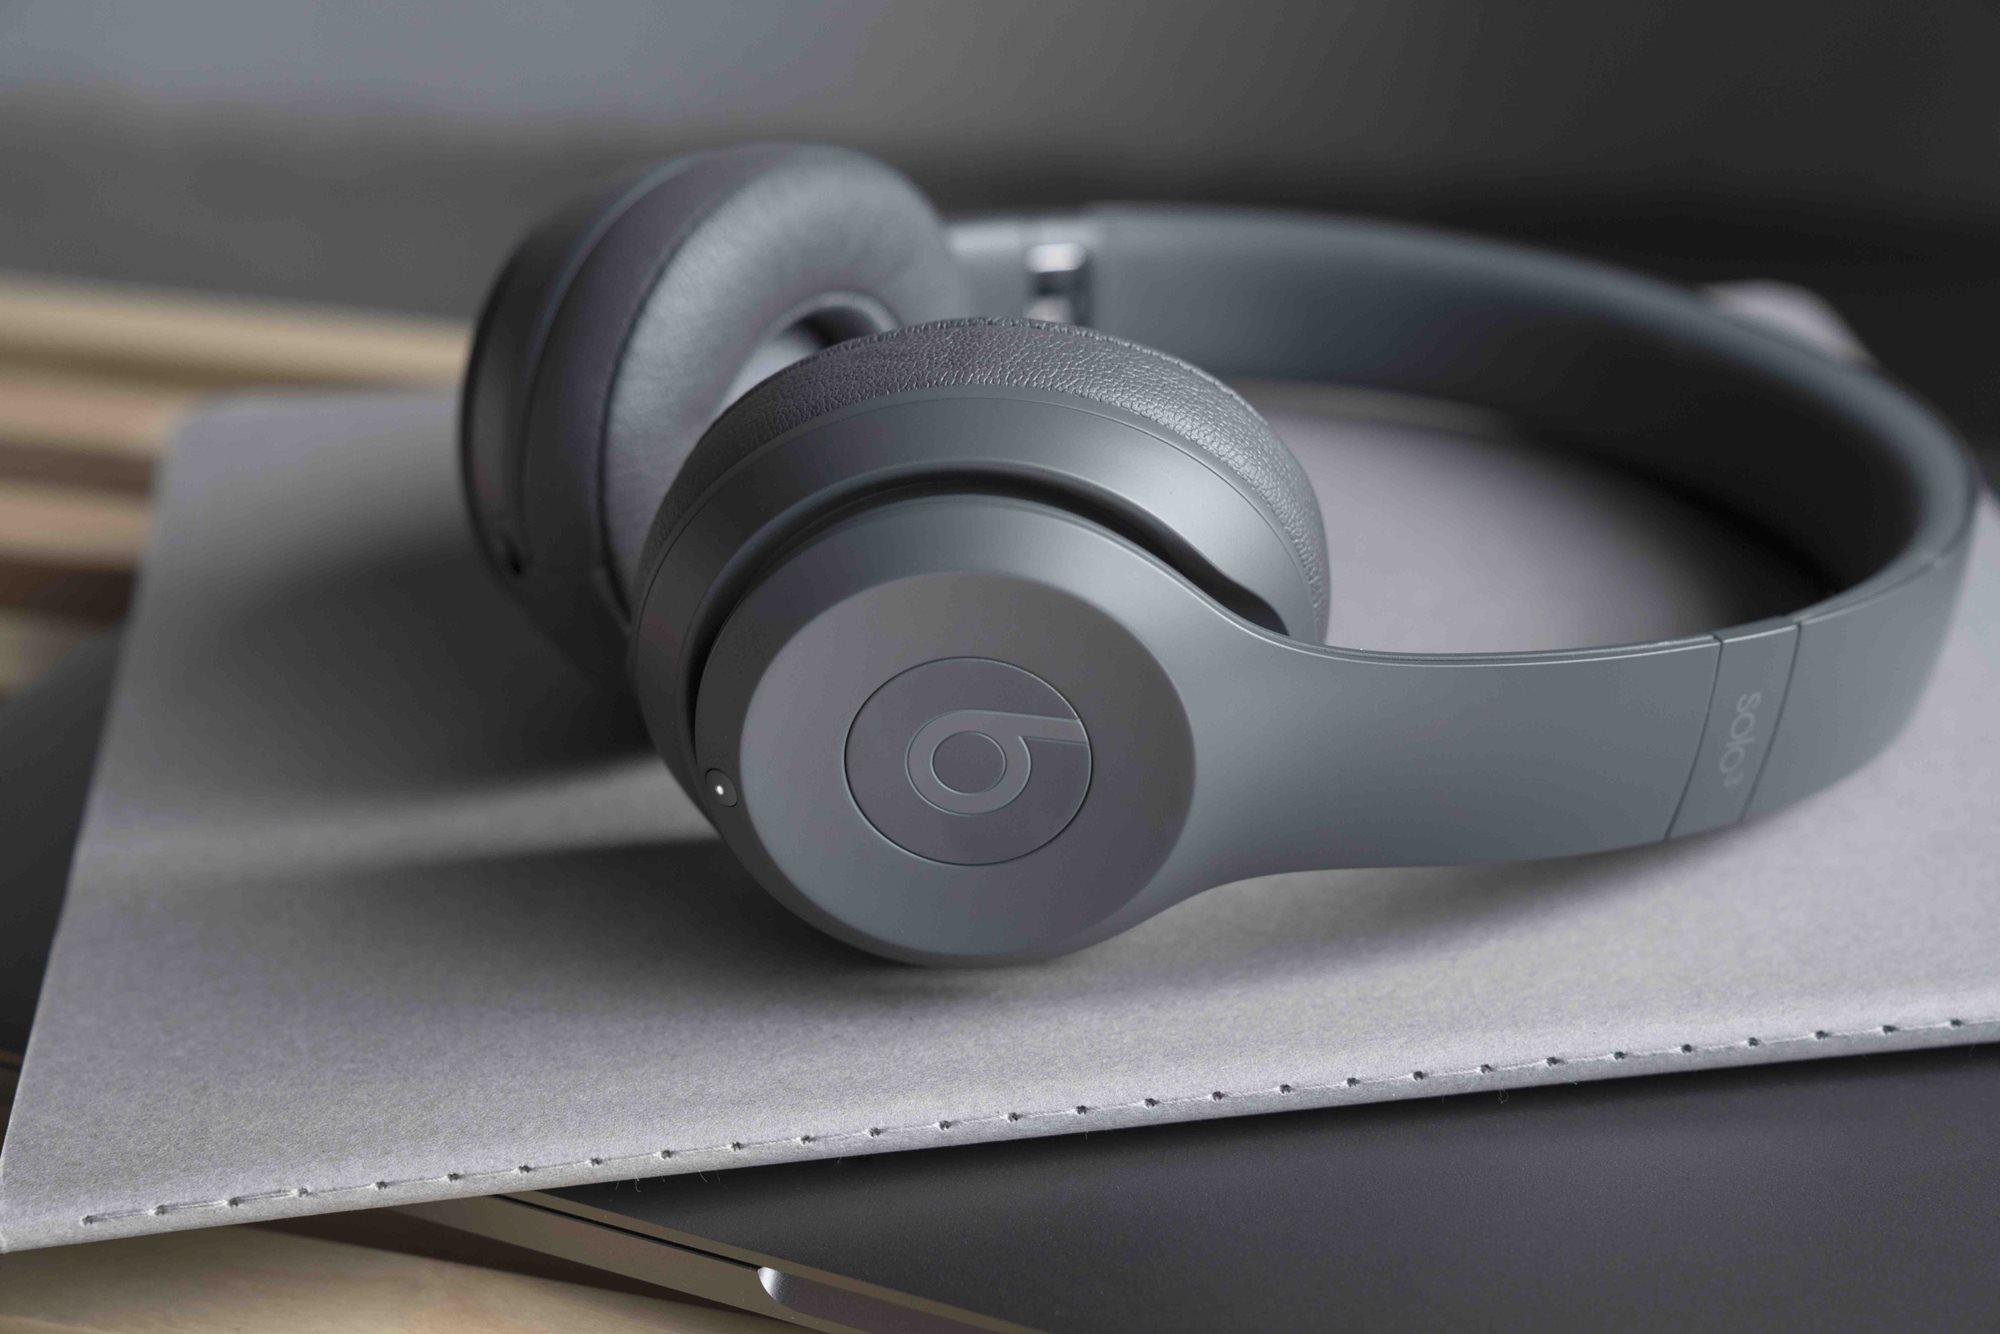 Beats by Dre Solo 3 On-Ear Wireless Headphones and get a pair of Powerbeats 3 Wireless Earphones FREE £209.90 @ Argos